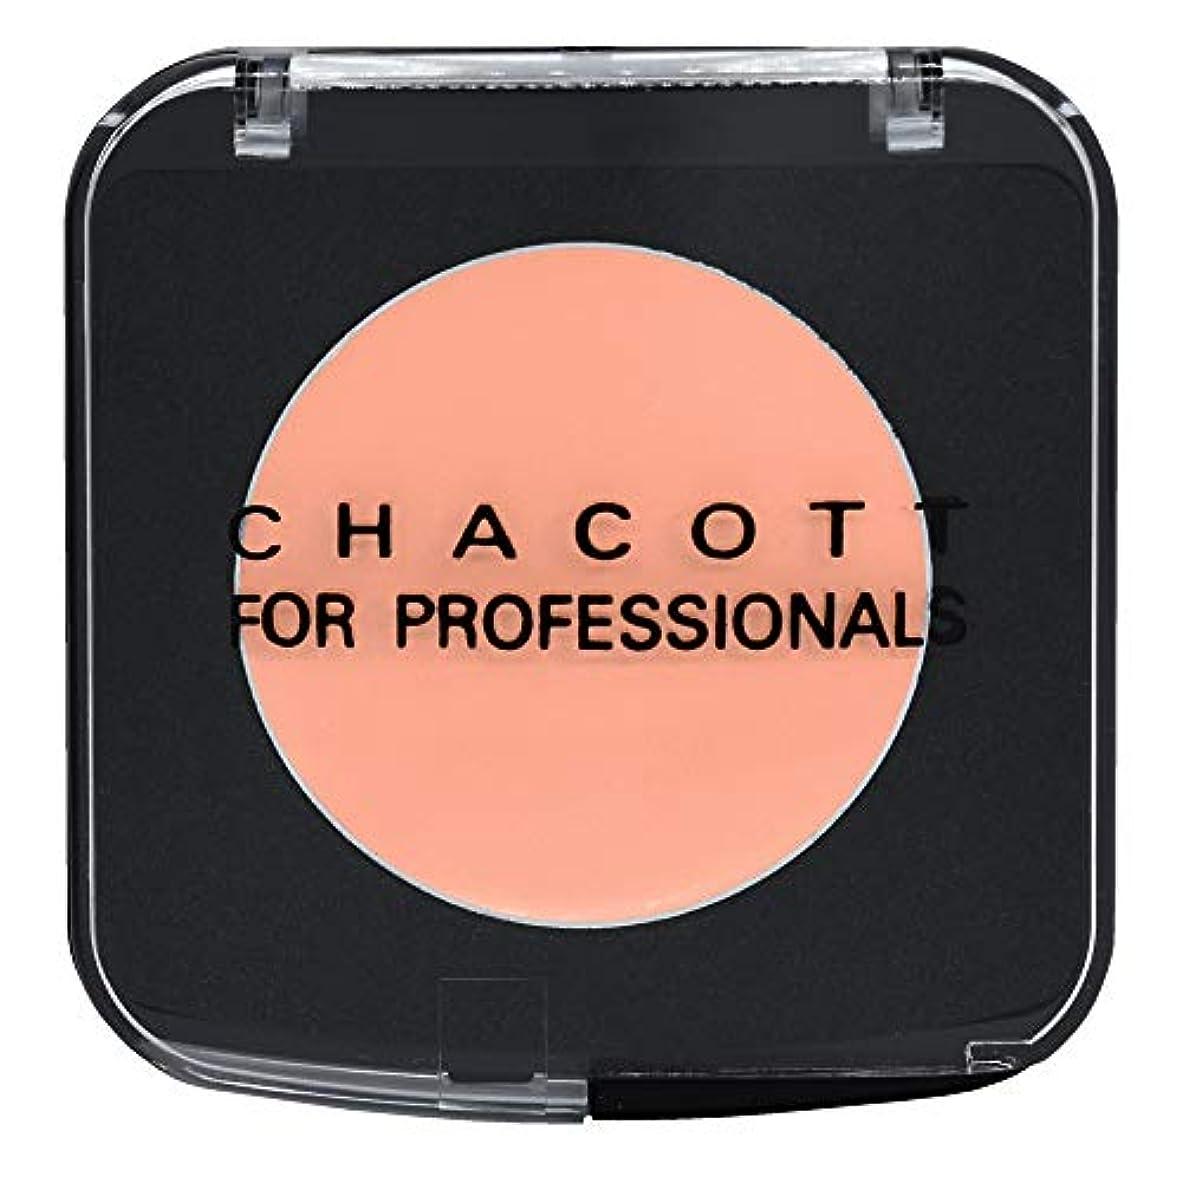 CHACOTT<チャコット> ステージファンデーション 409